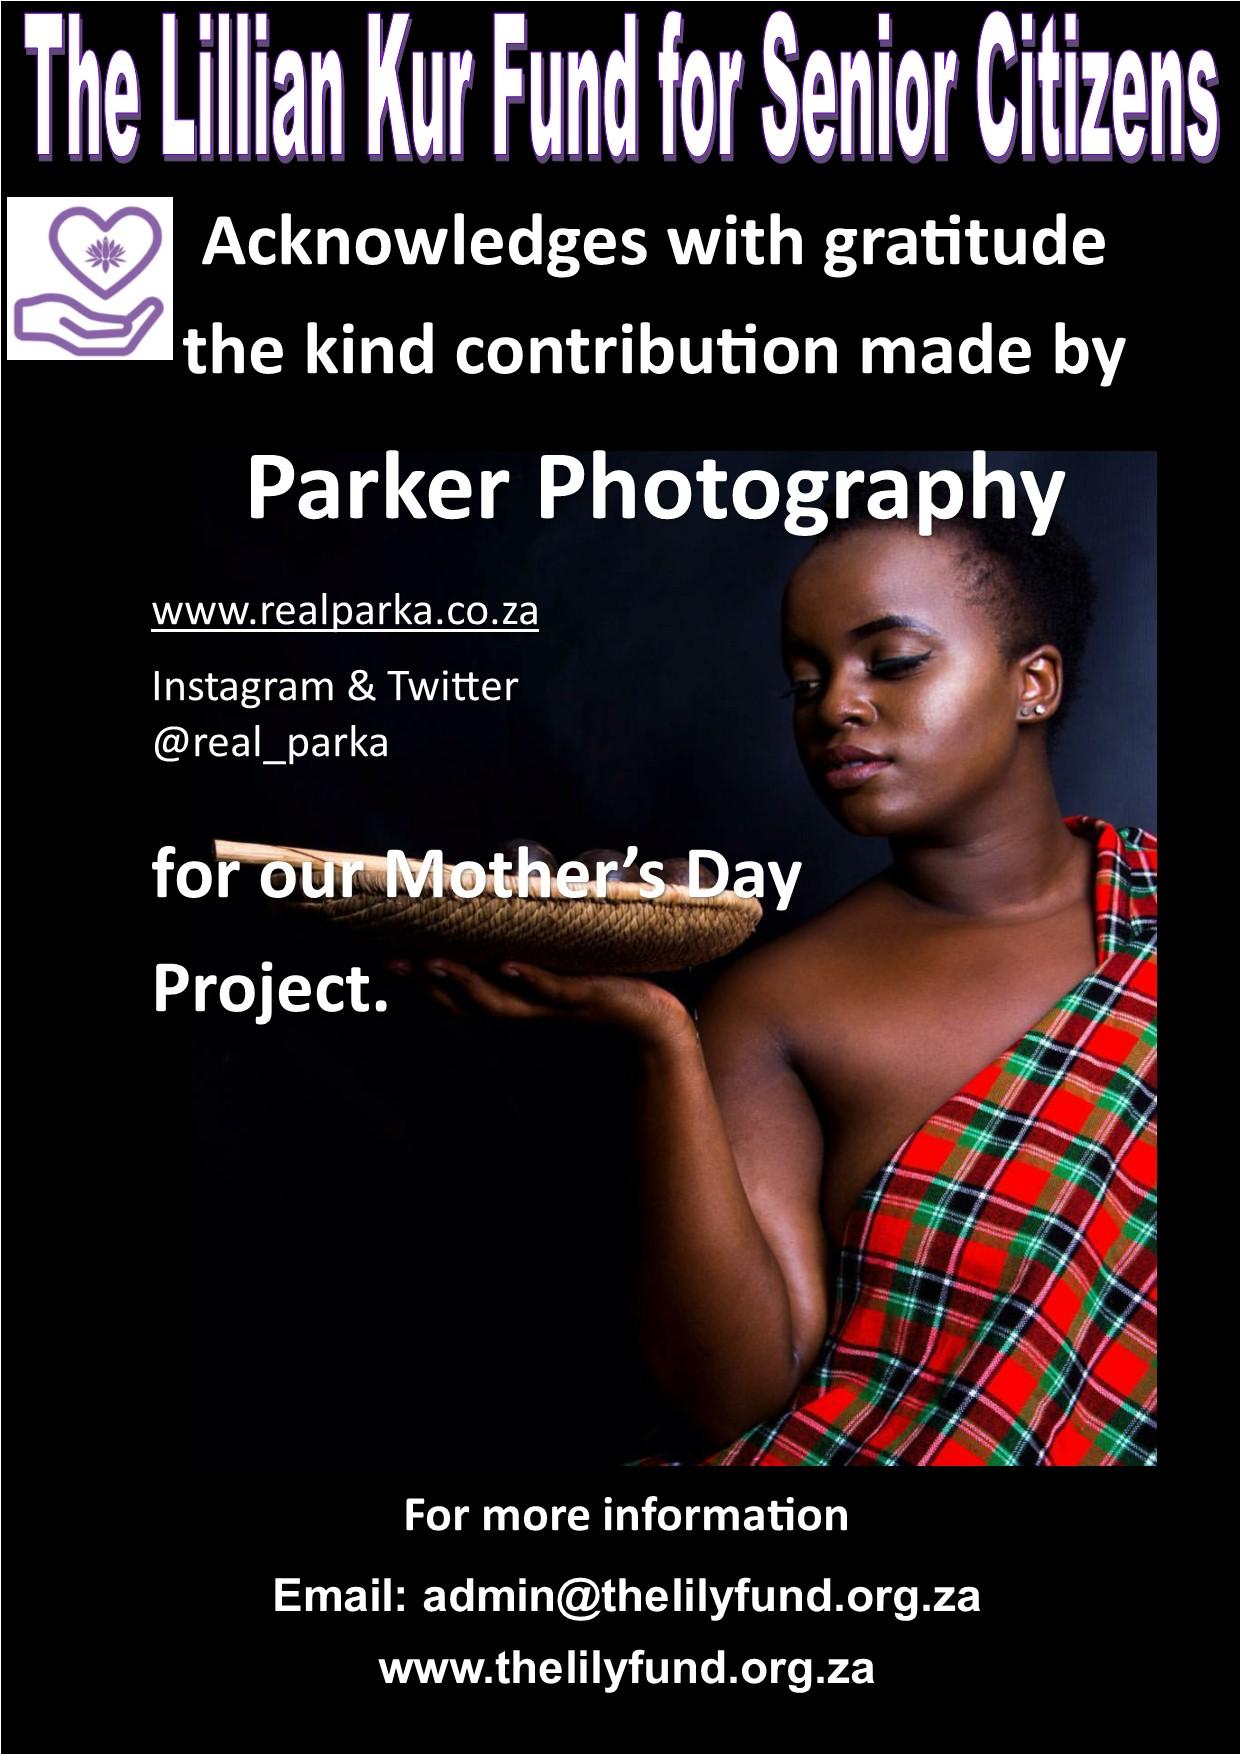 Parker Photography